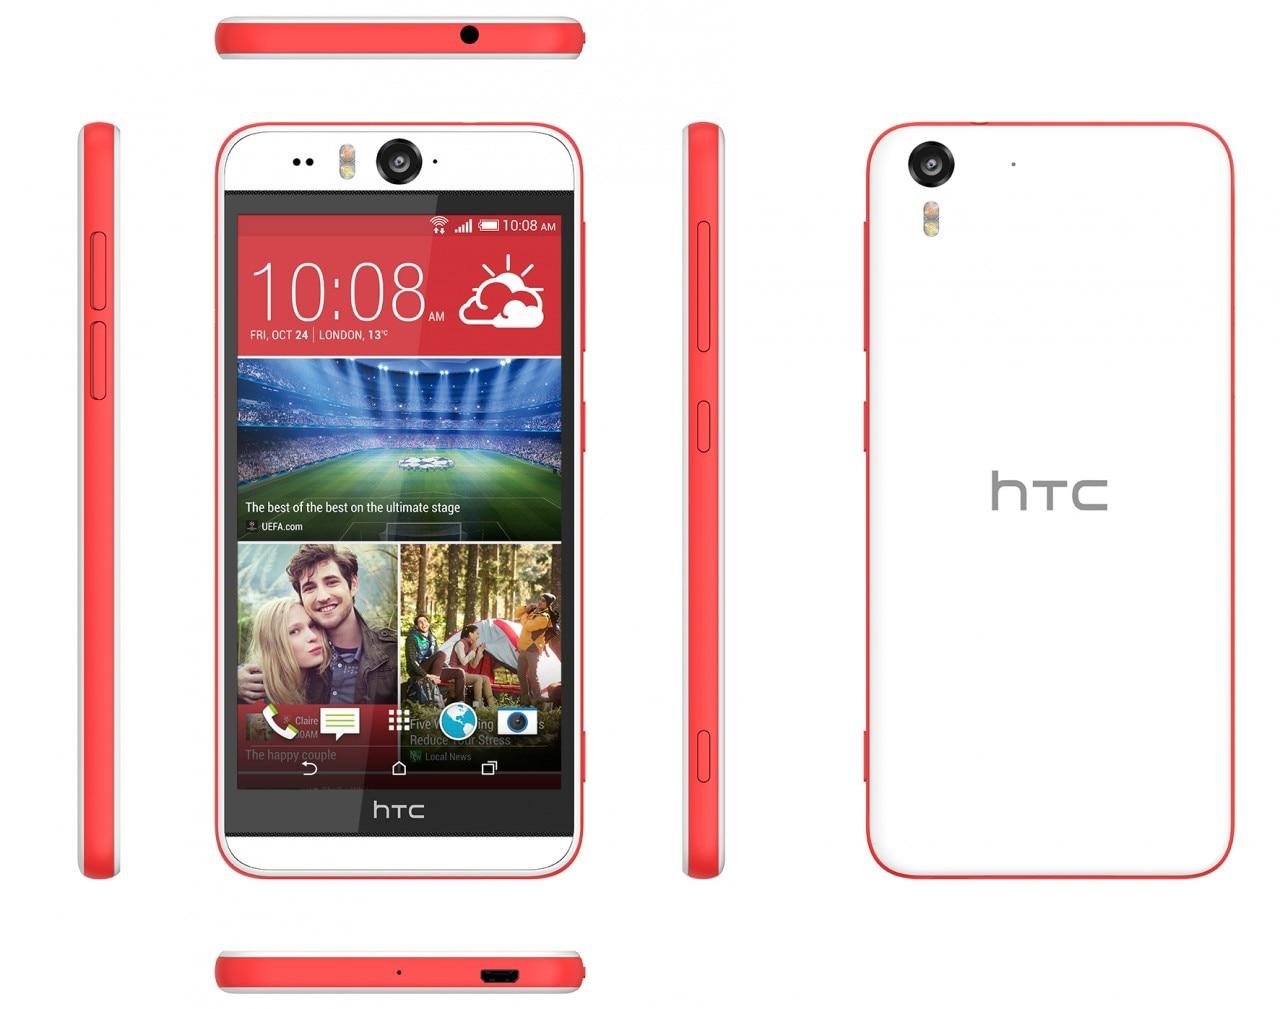 HTC Desire Eye Matt White explosion 300 dpi